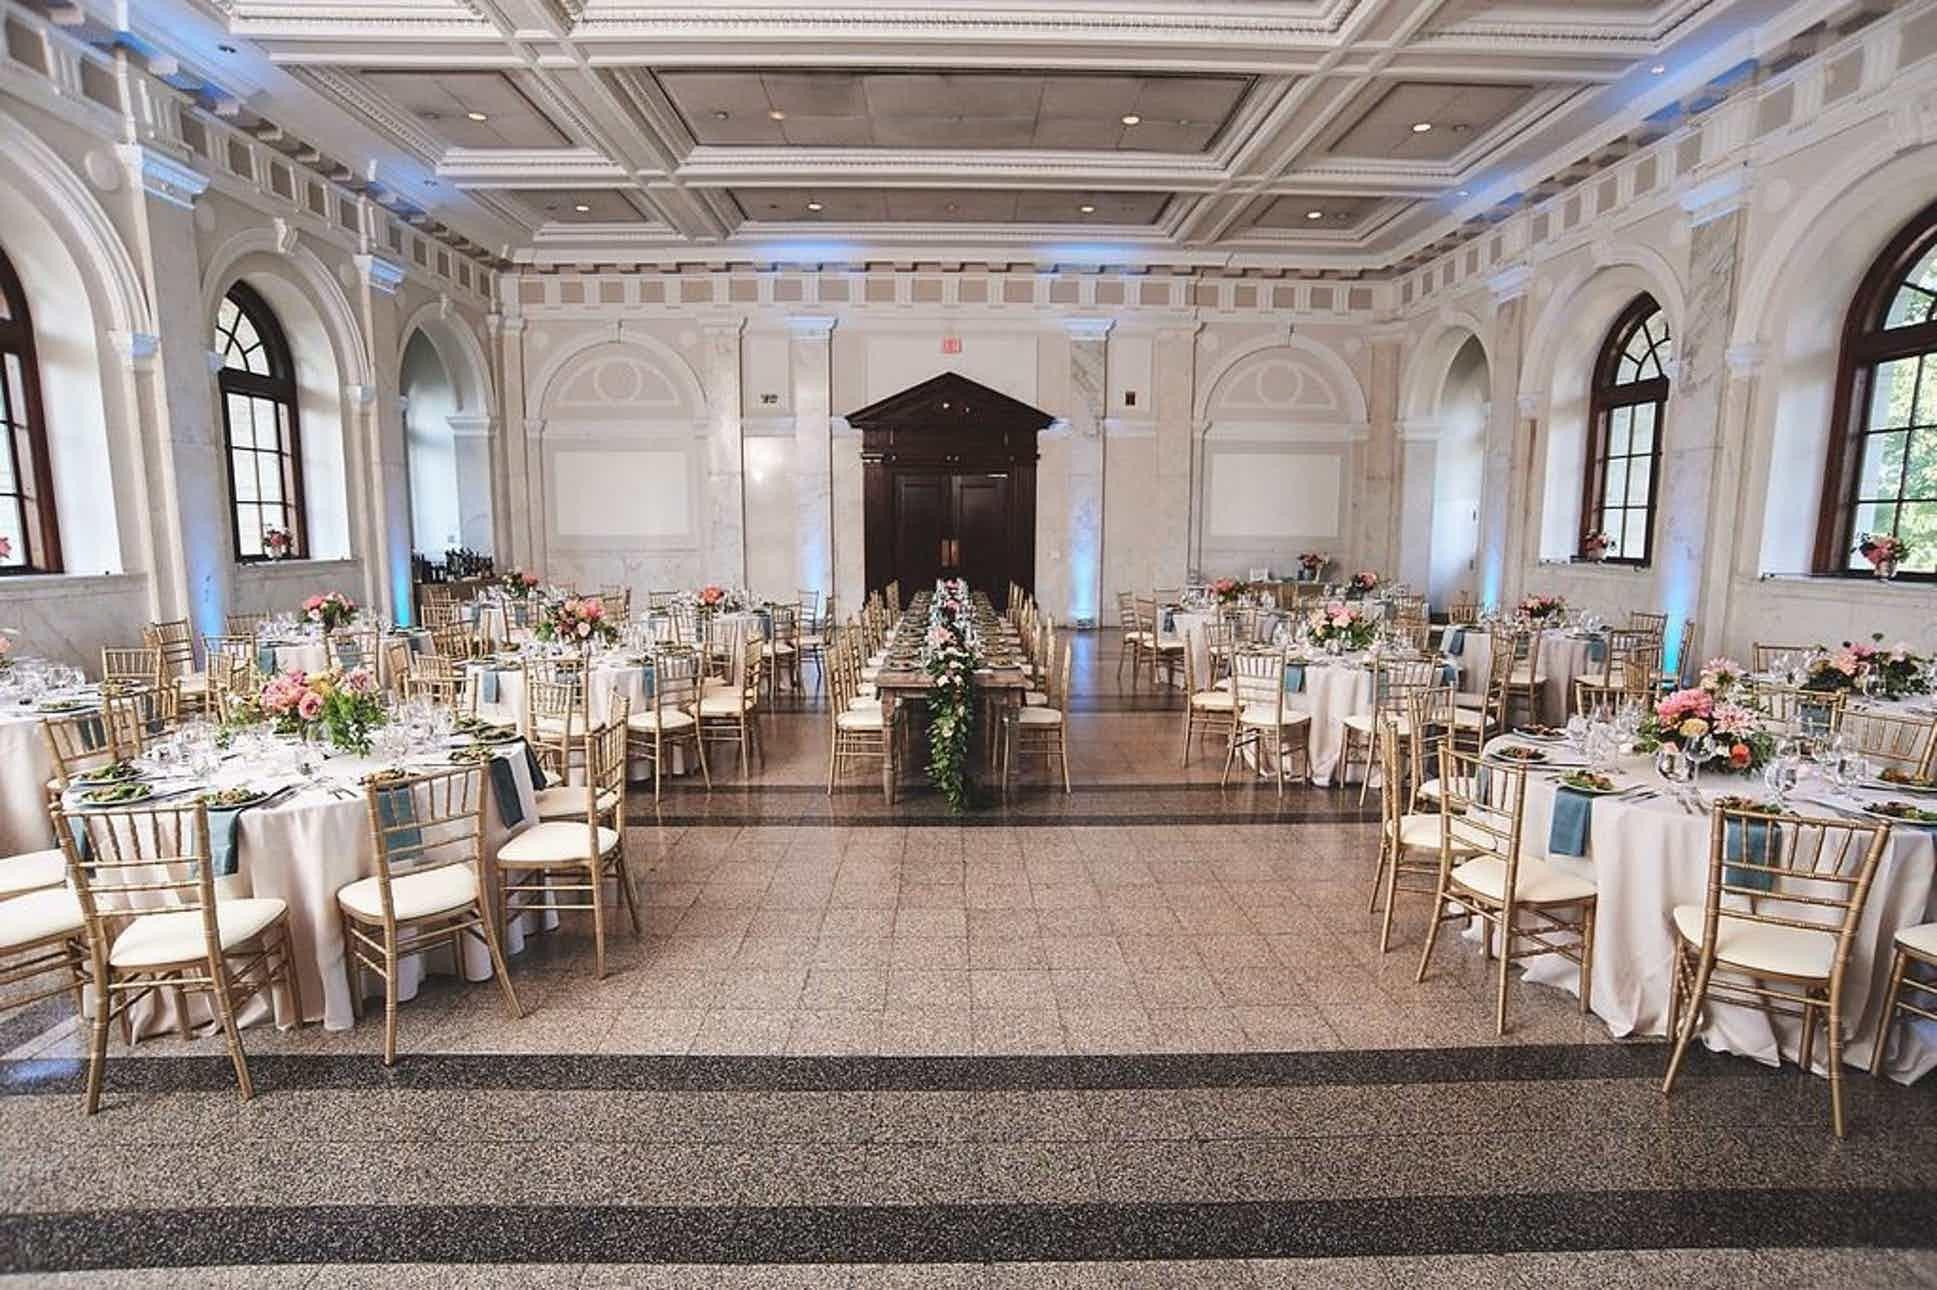 Historic Dekalb Courthouse Decatur Georgia 3 Beautiful Wedding Reception Atlanta Wedding Venues Wedding Reception Decorations